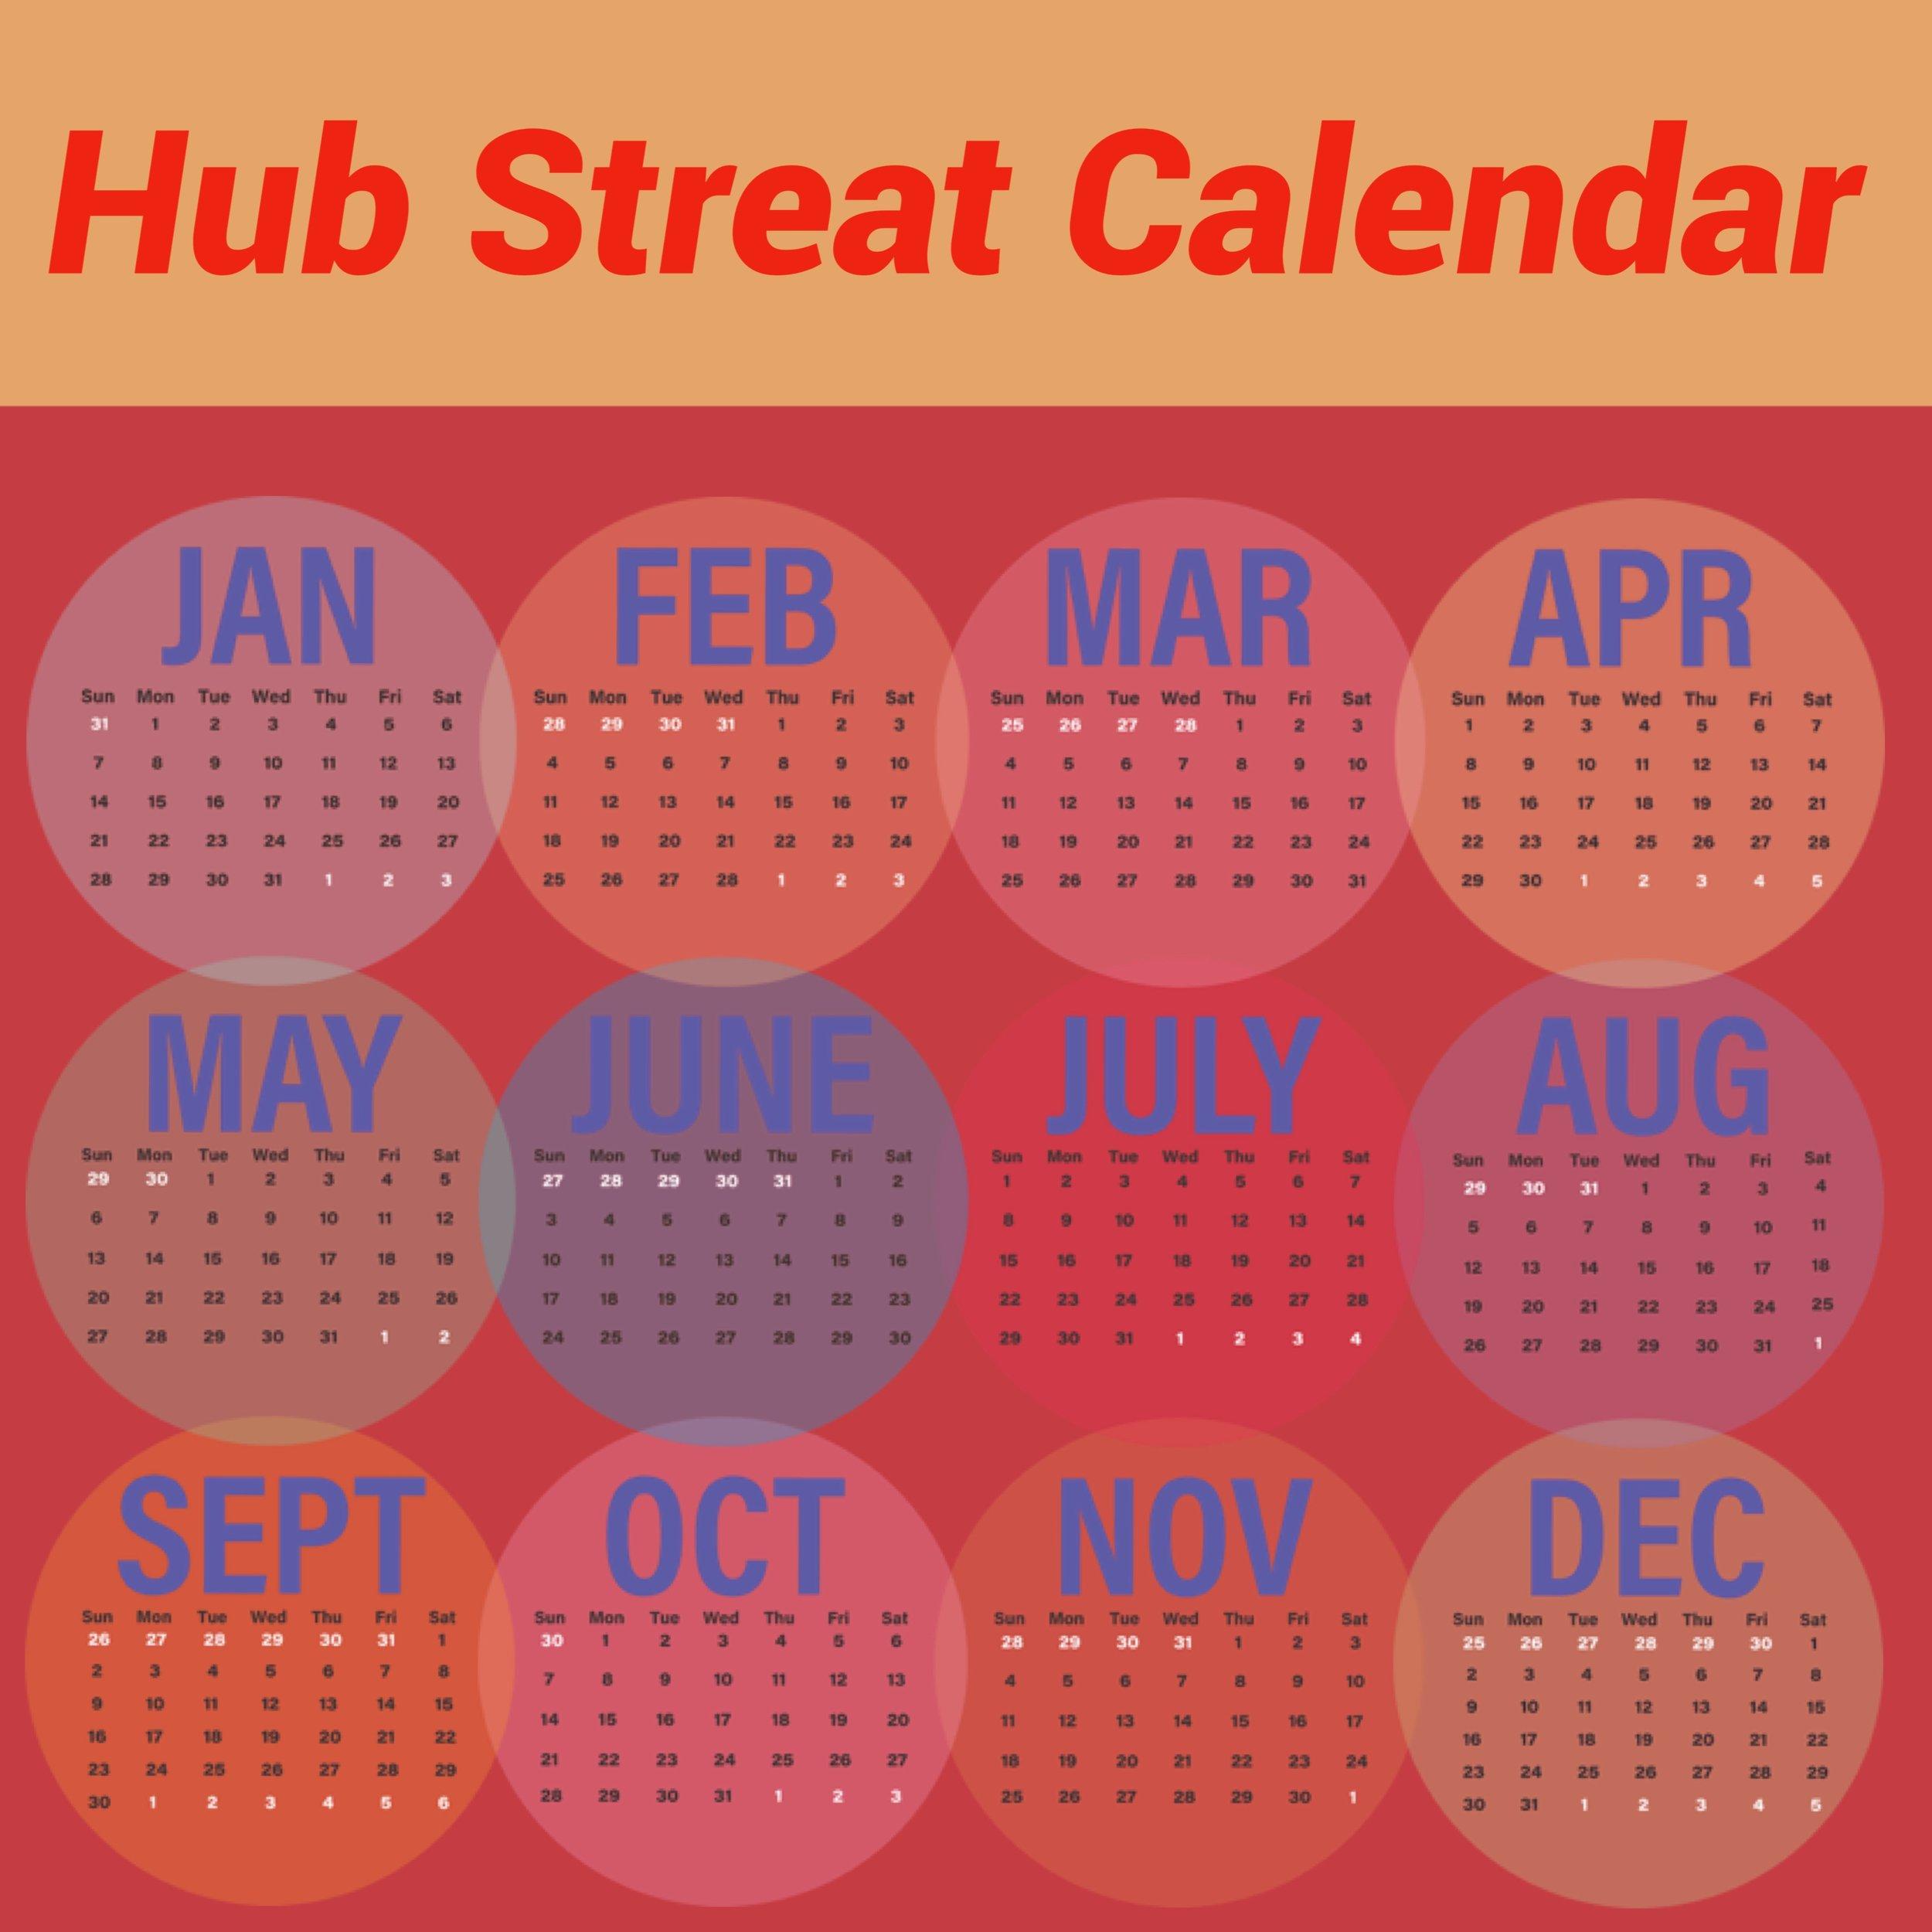 Hub Streat Stock Calender.jpeg